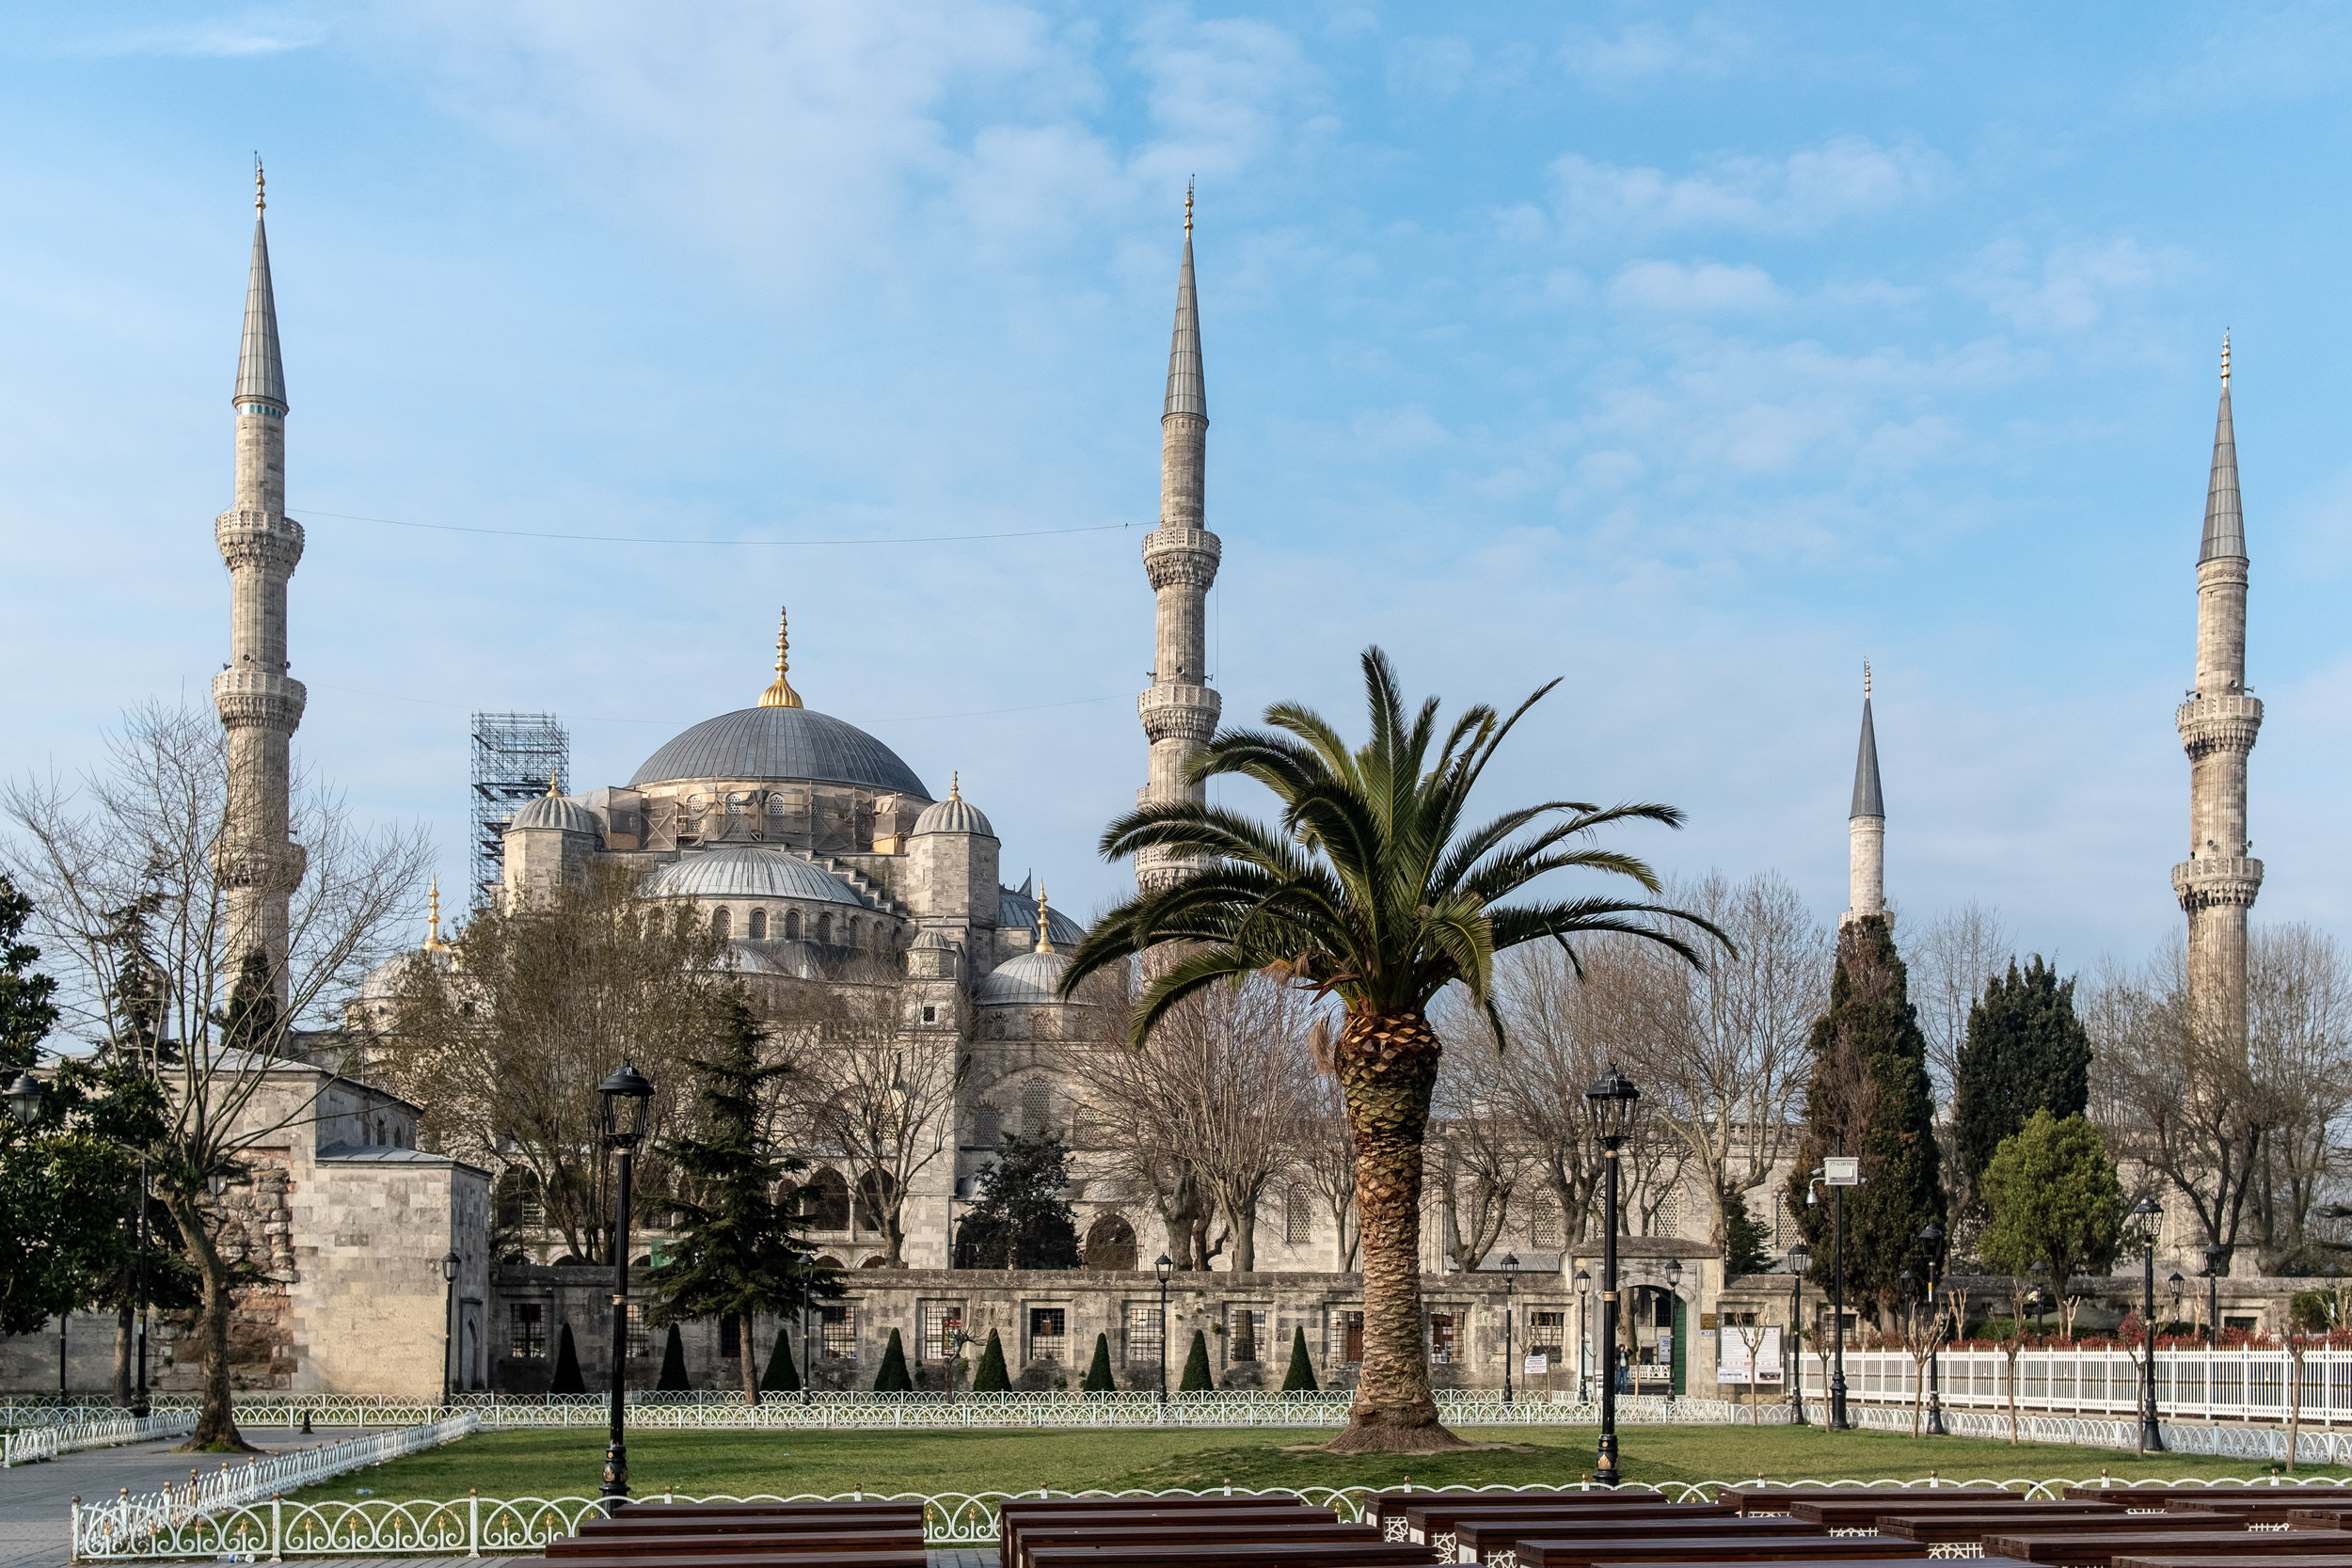 20190407 - Turkey - 0778.JPG